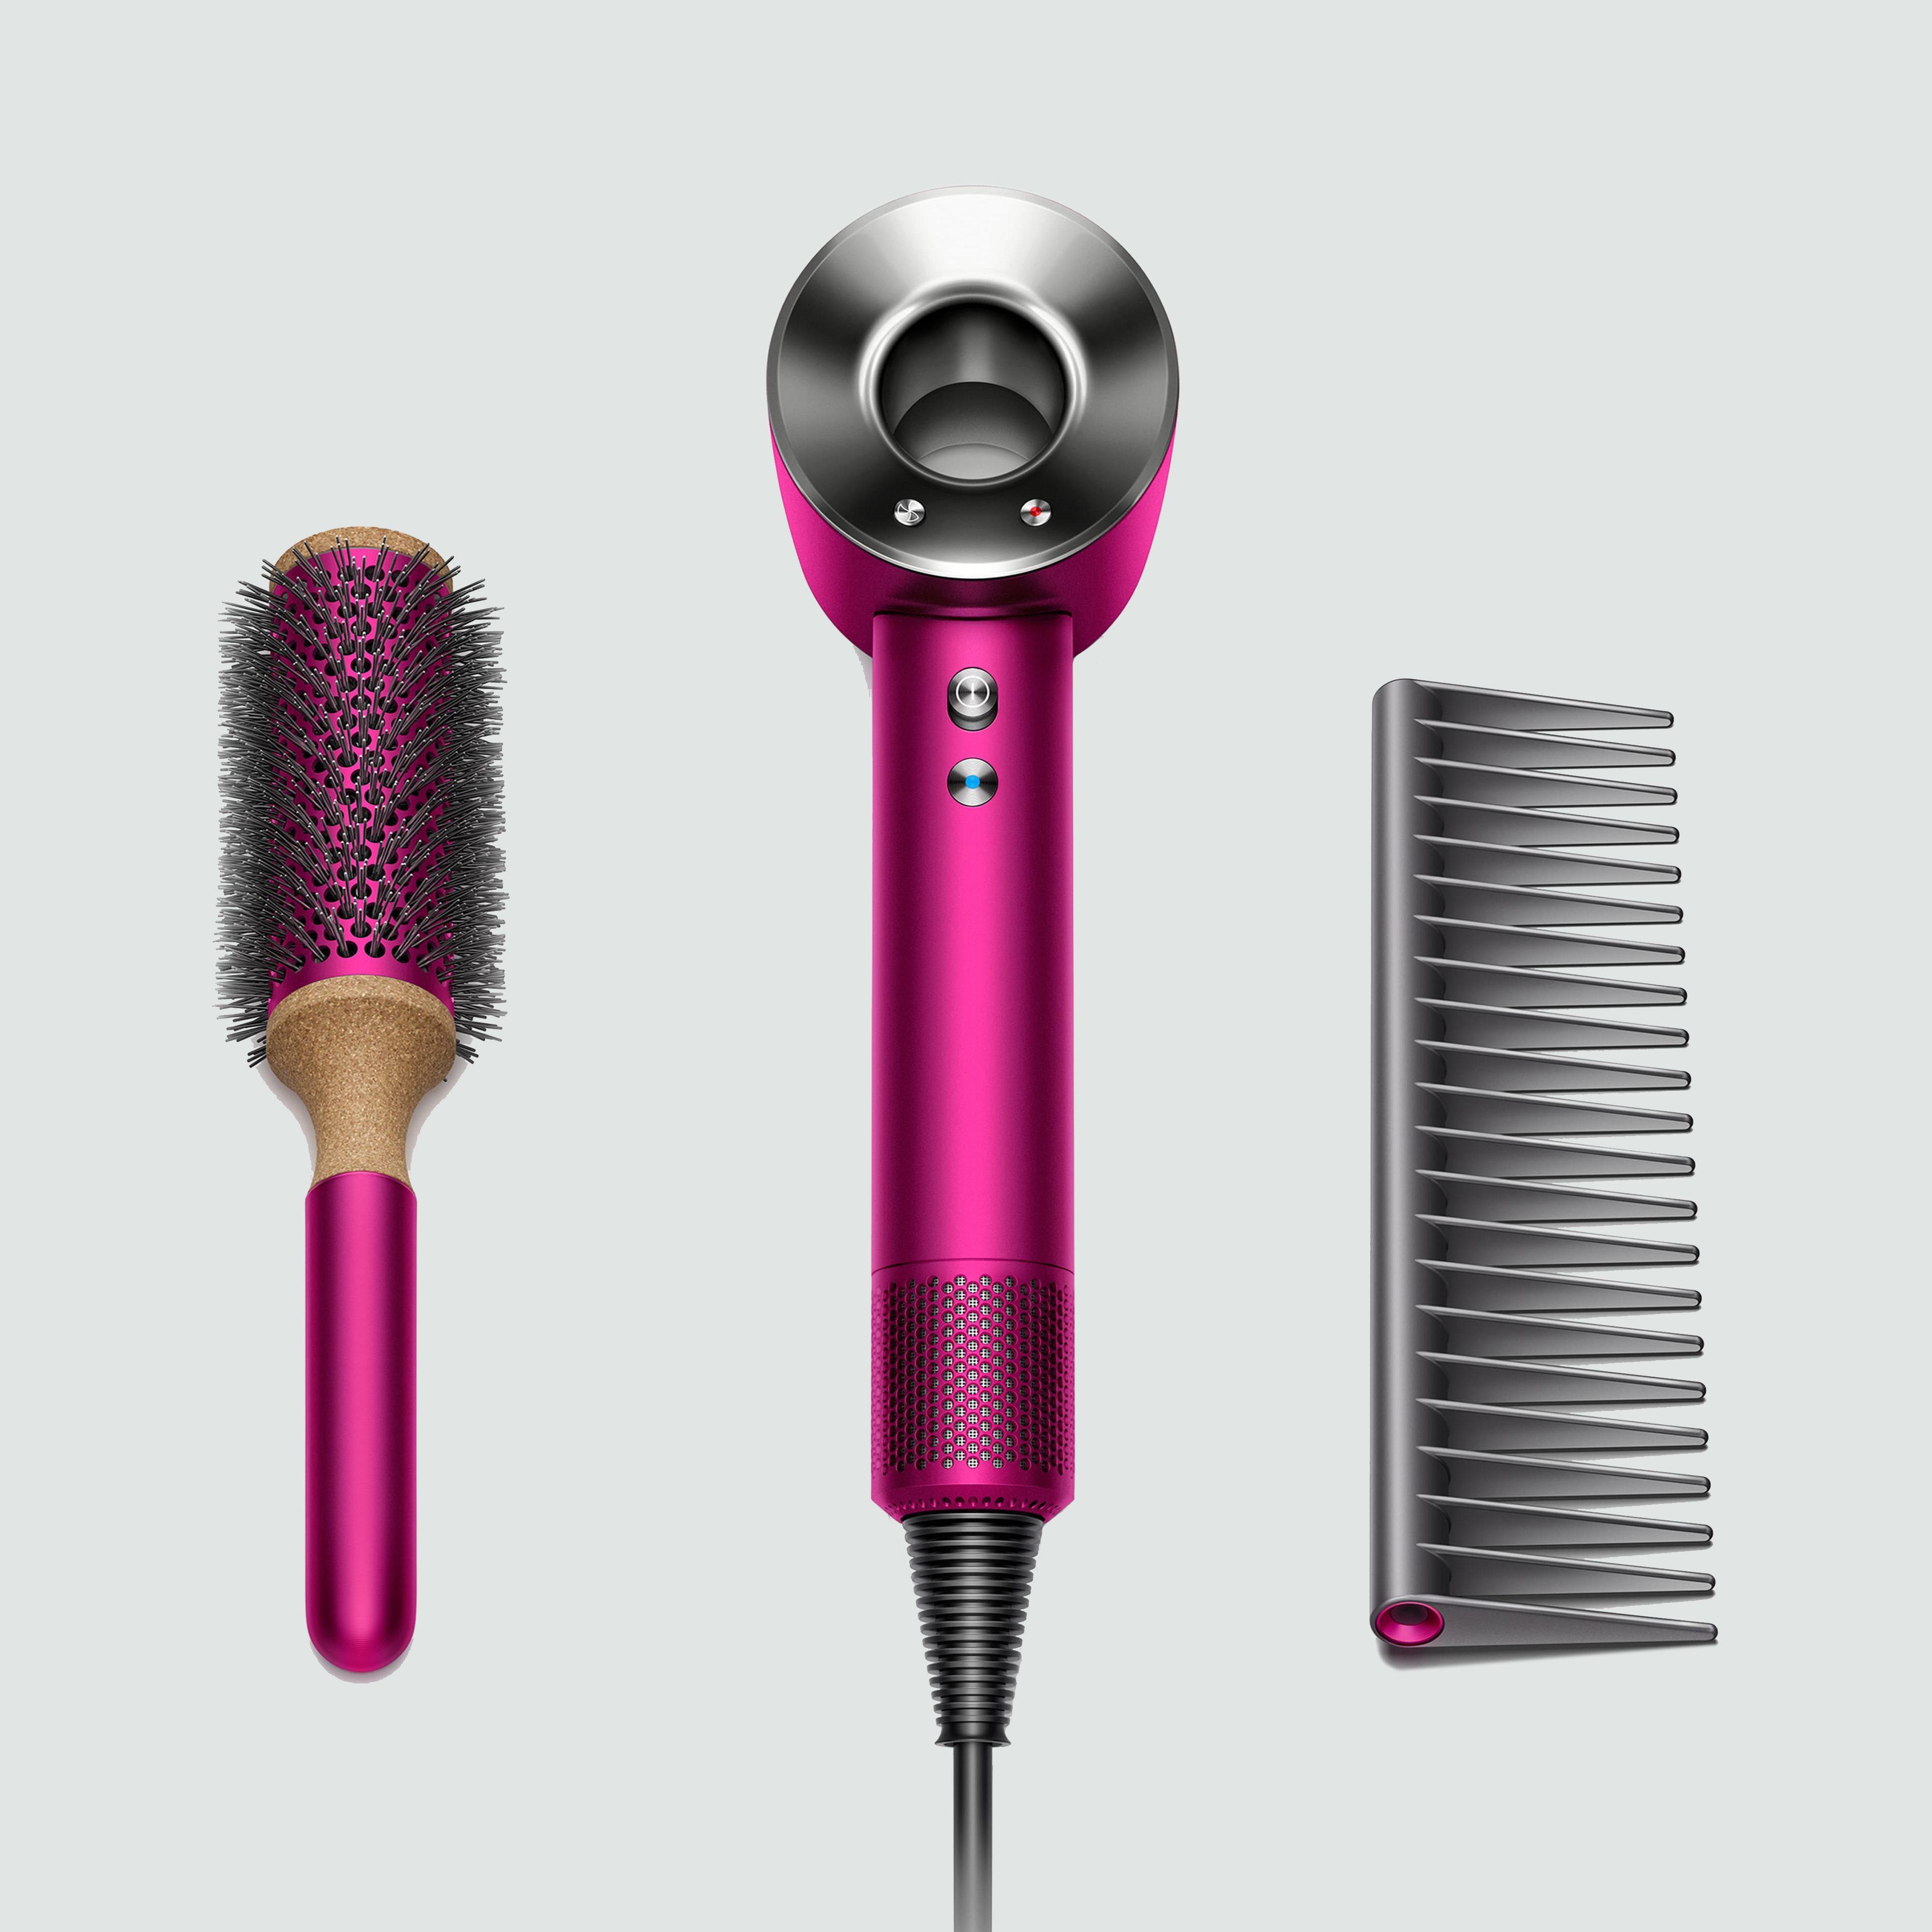 Dyson Supersonic™ Fuchsia Hair Dryer Set